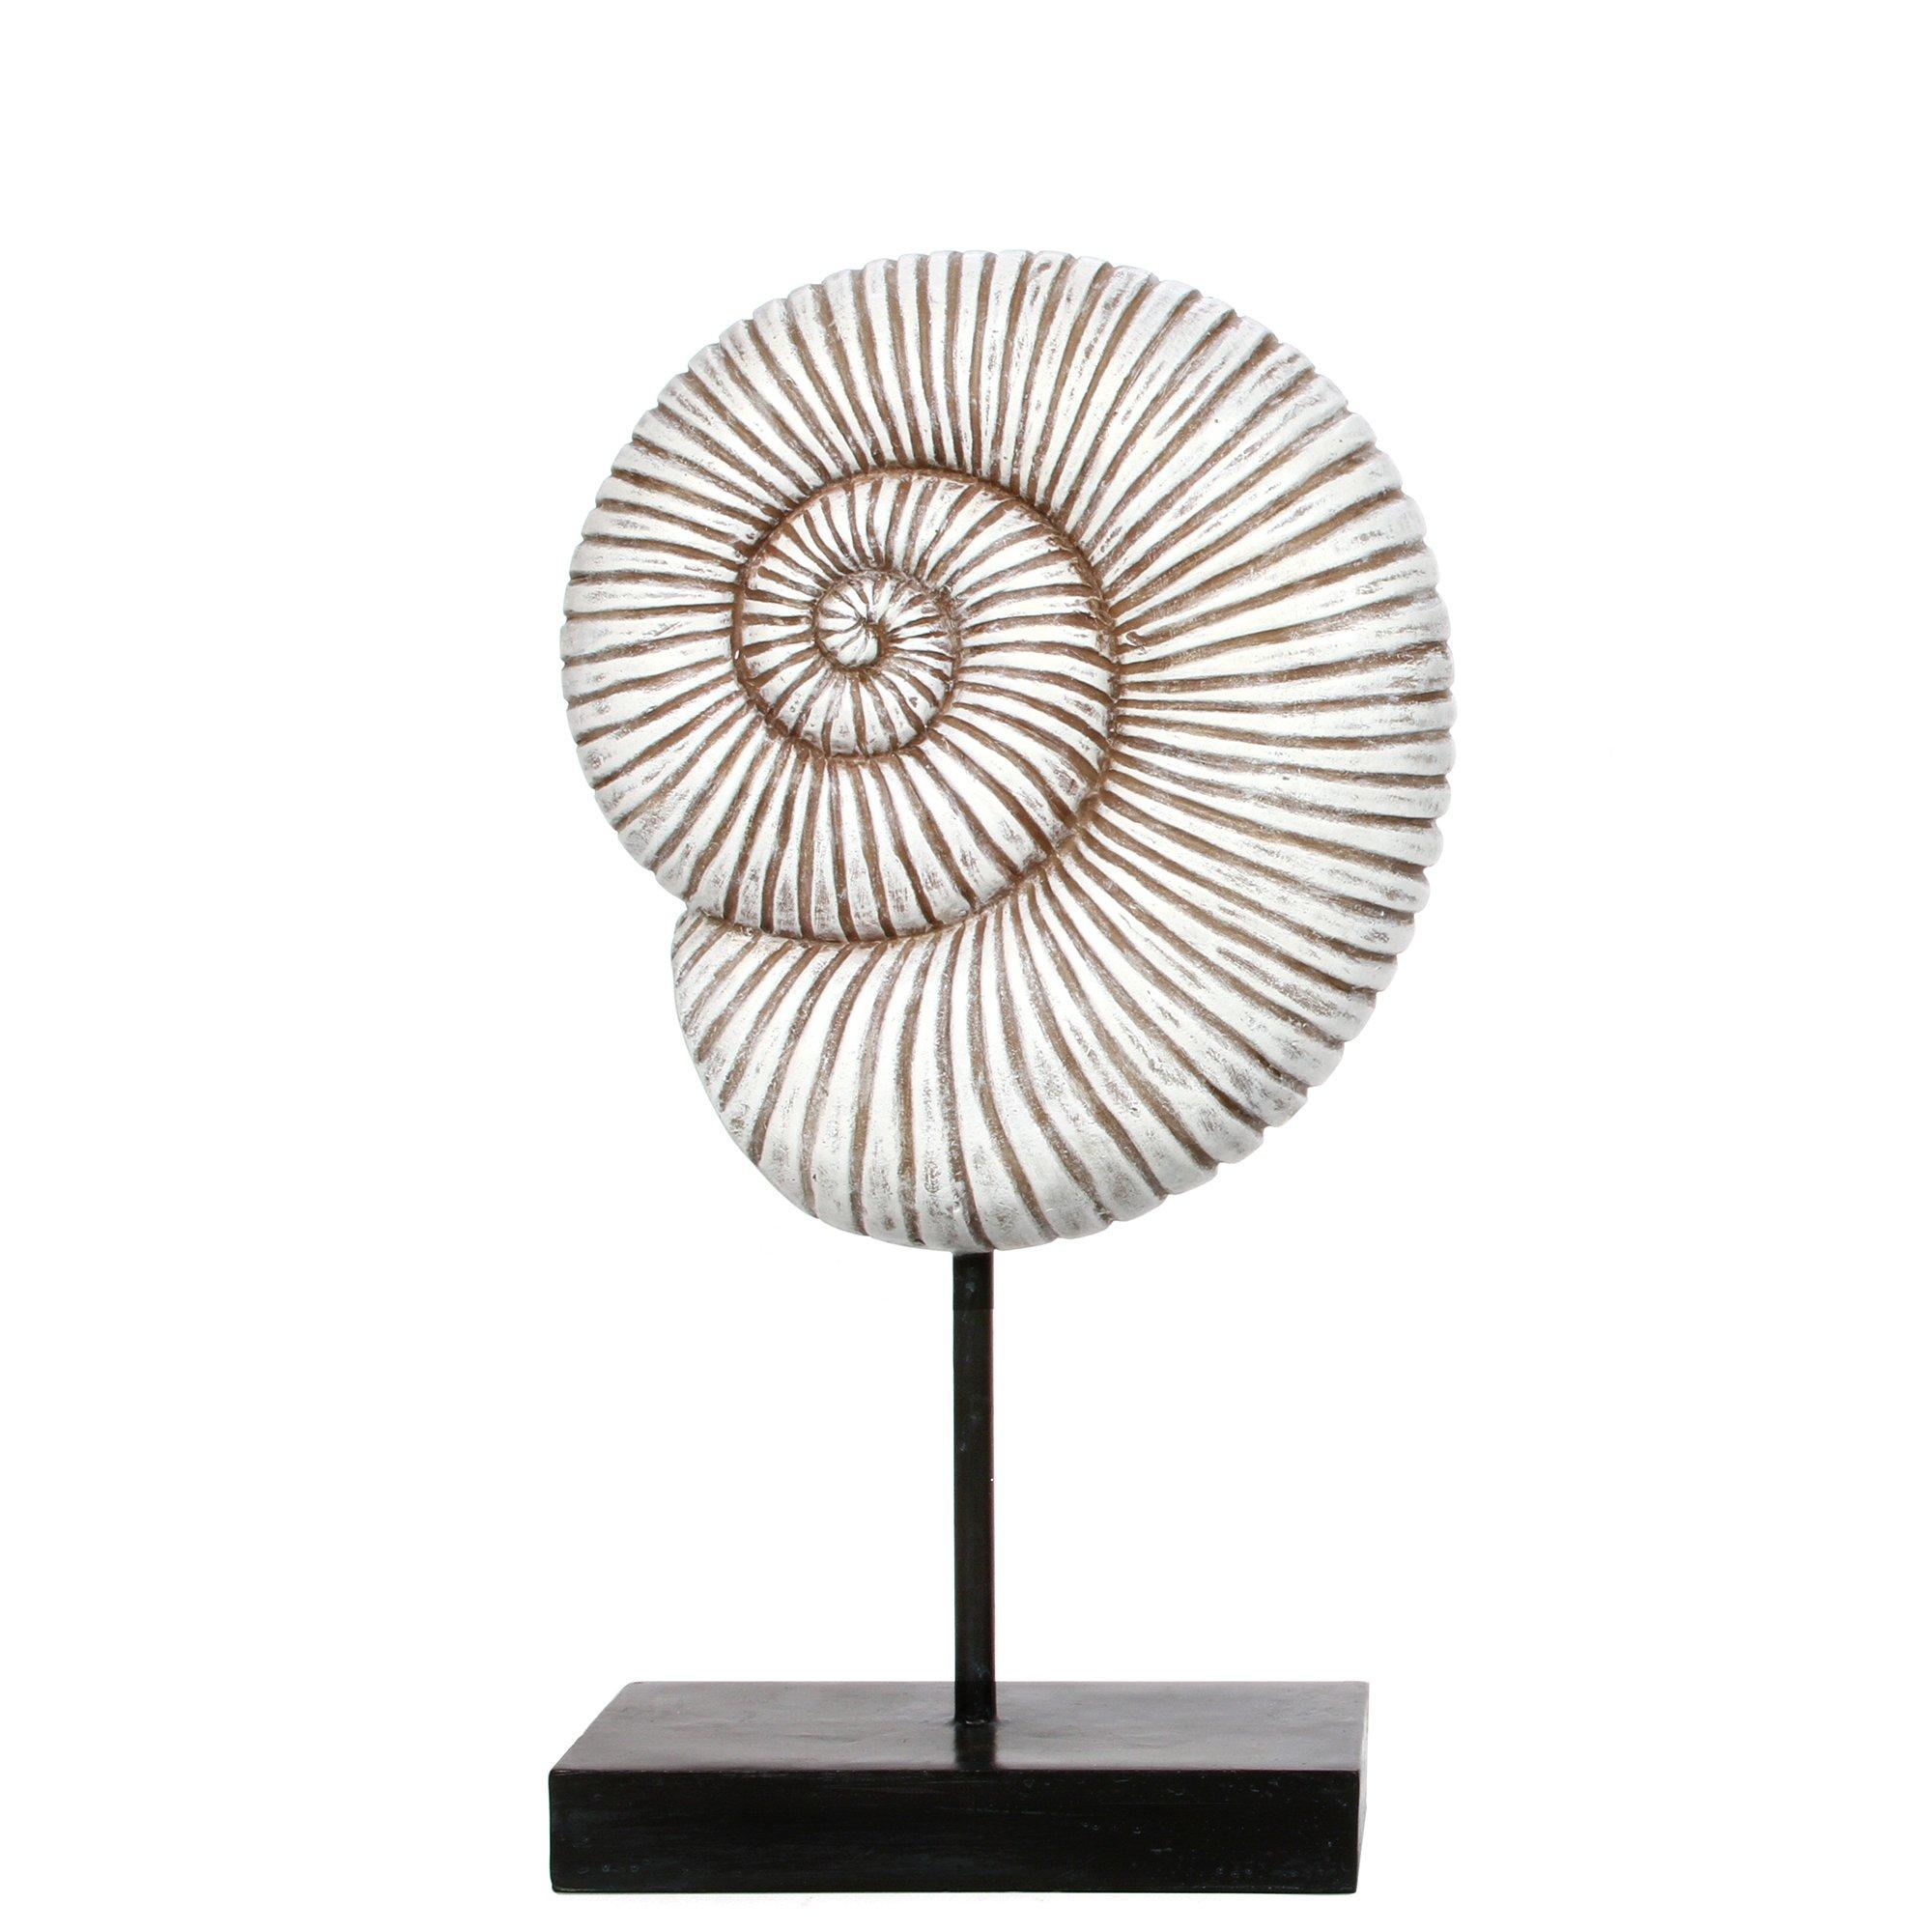 Hosley 12.9'' High, Decorative Tabletop Pedestal Shell. Ideal Gift for Wedding, Home, Party Favor, Spa, Reiki, Meditation, Bathroom Settings P9